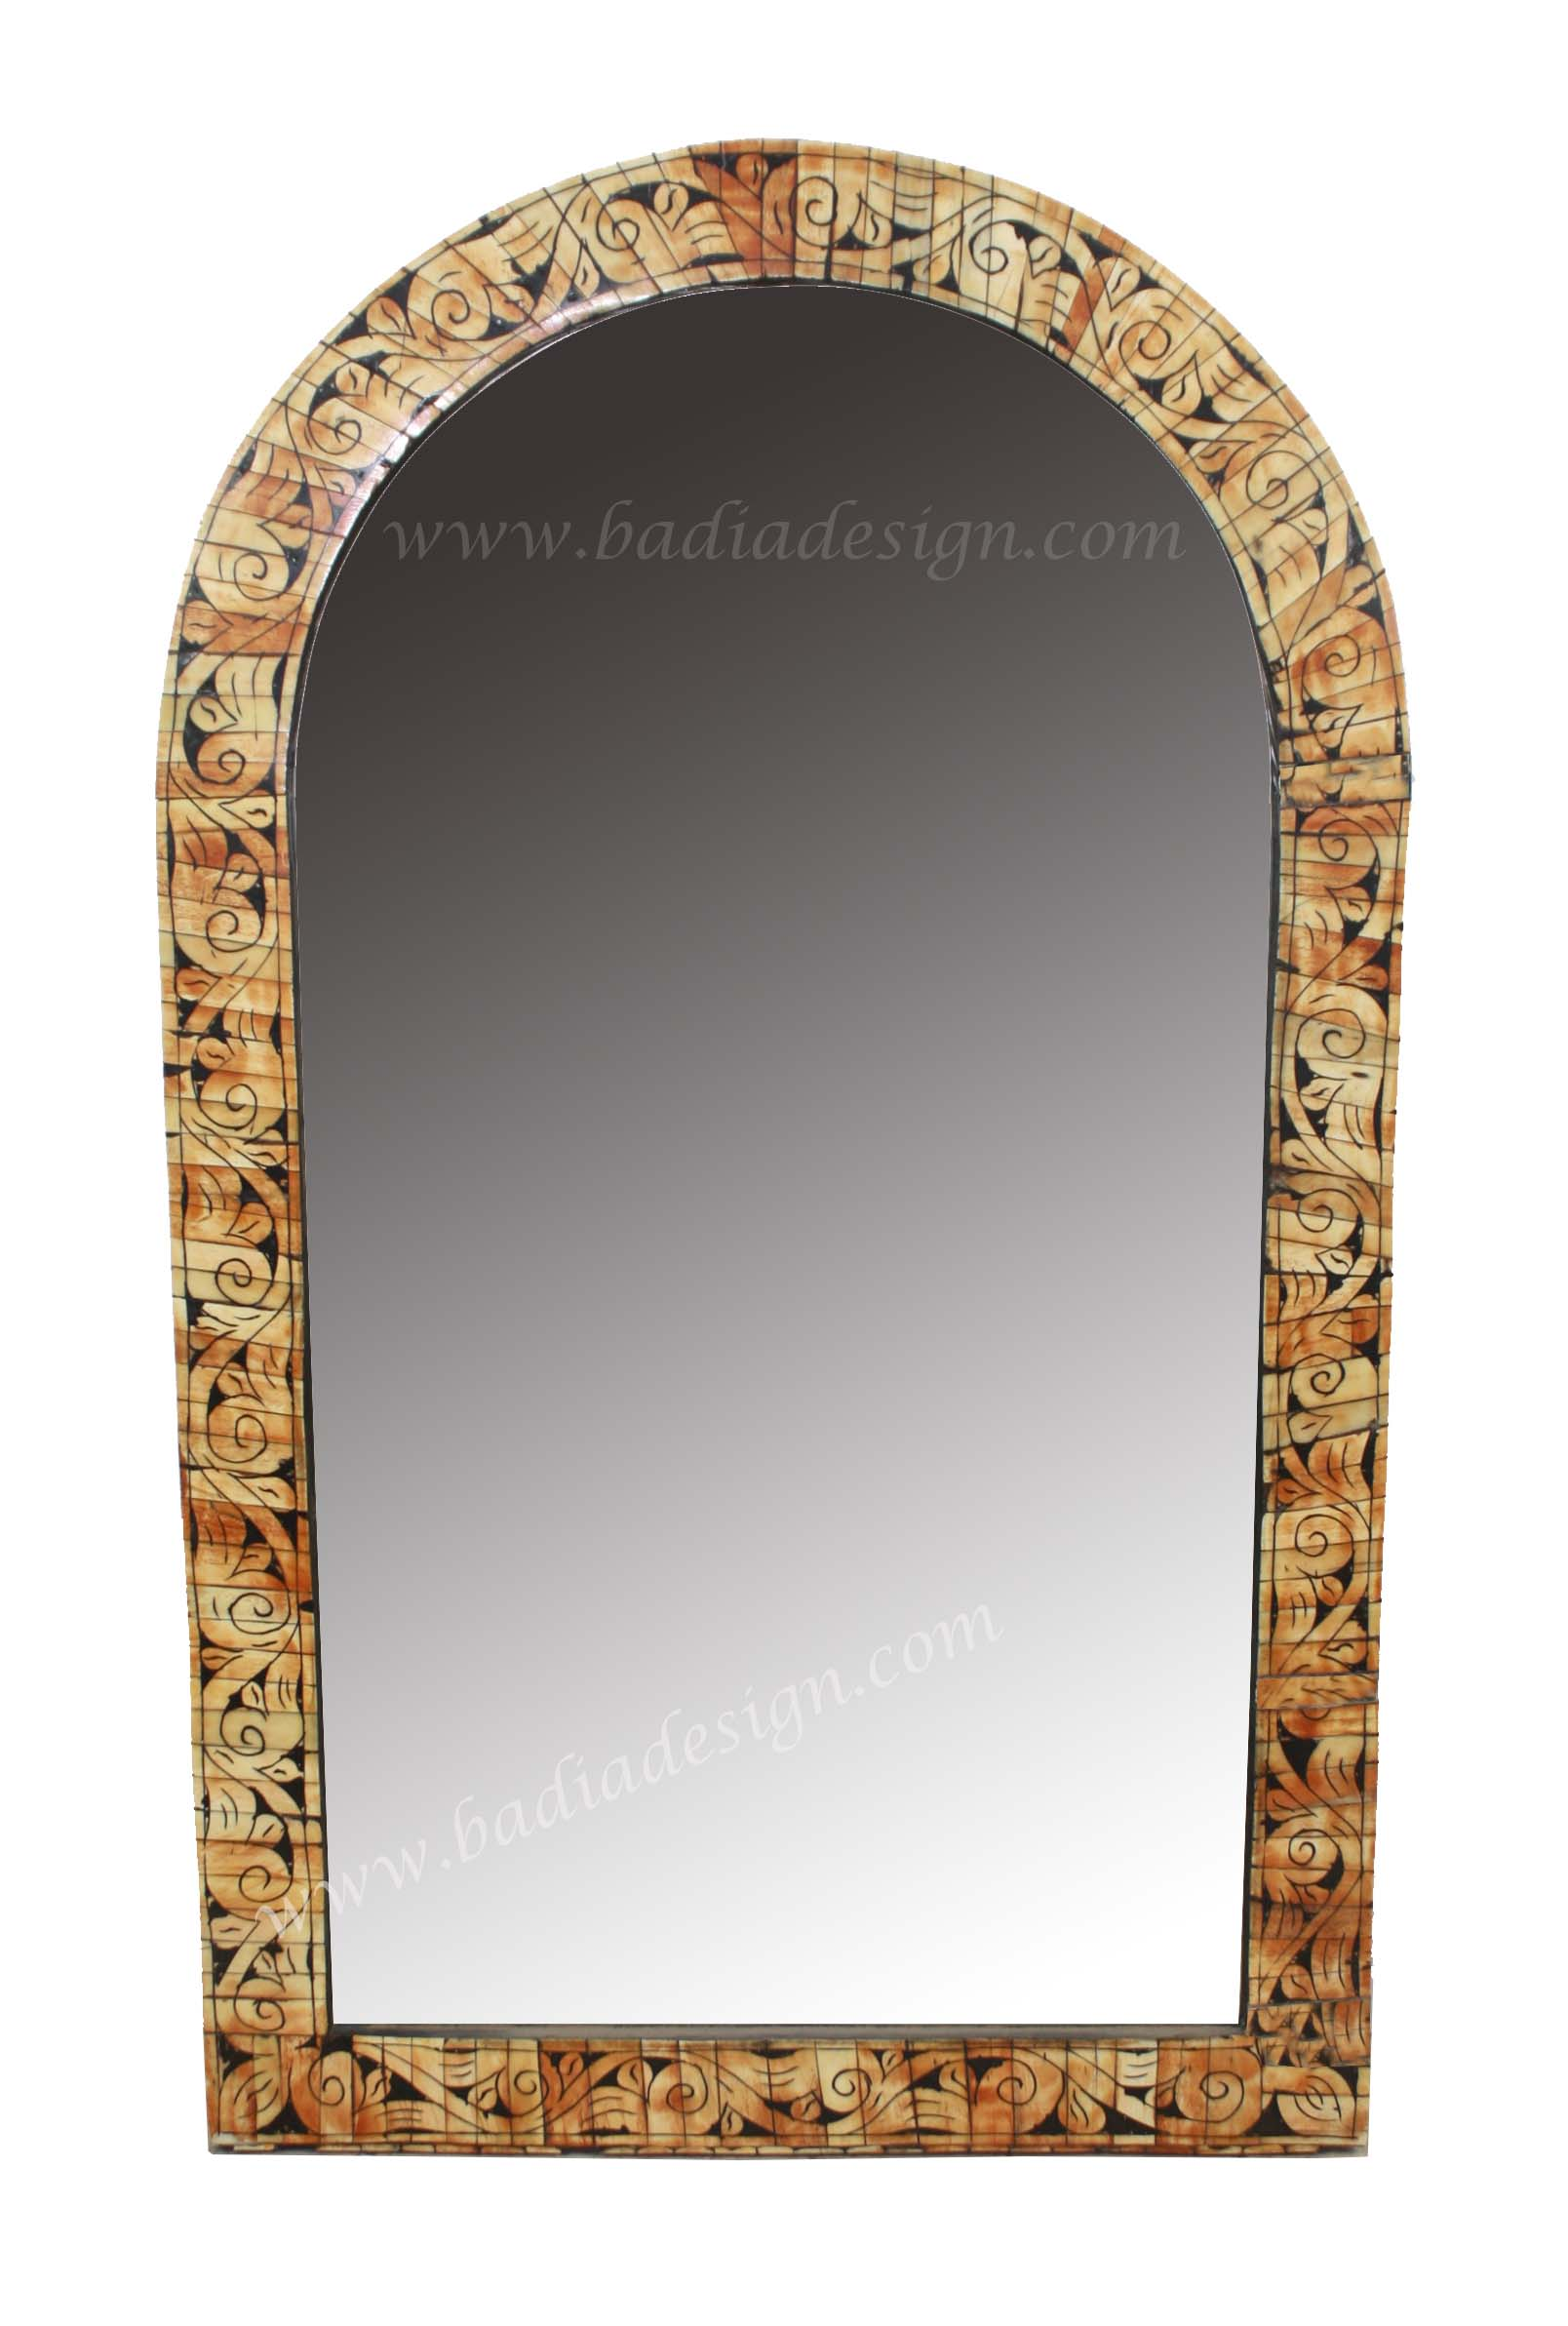 moroccan-camel-bone-mirror-m-cb012.jpg